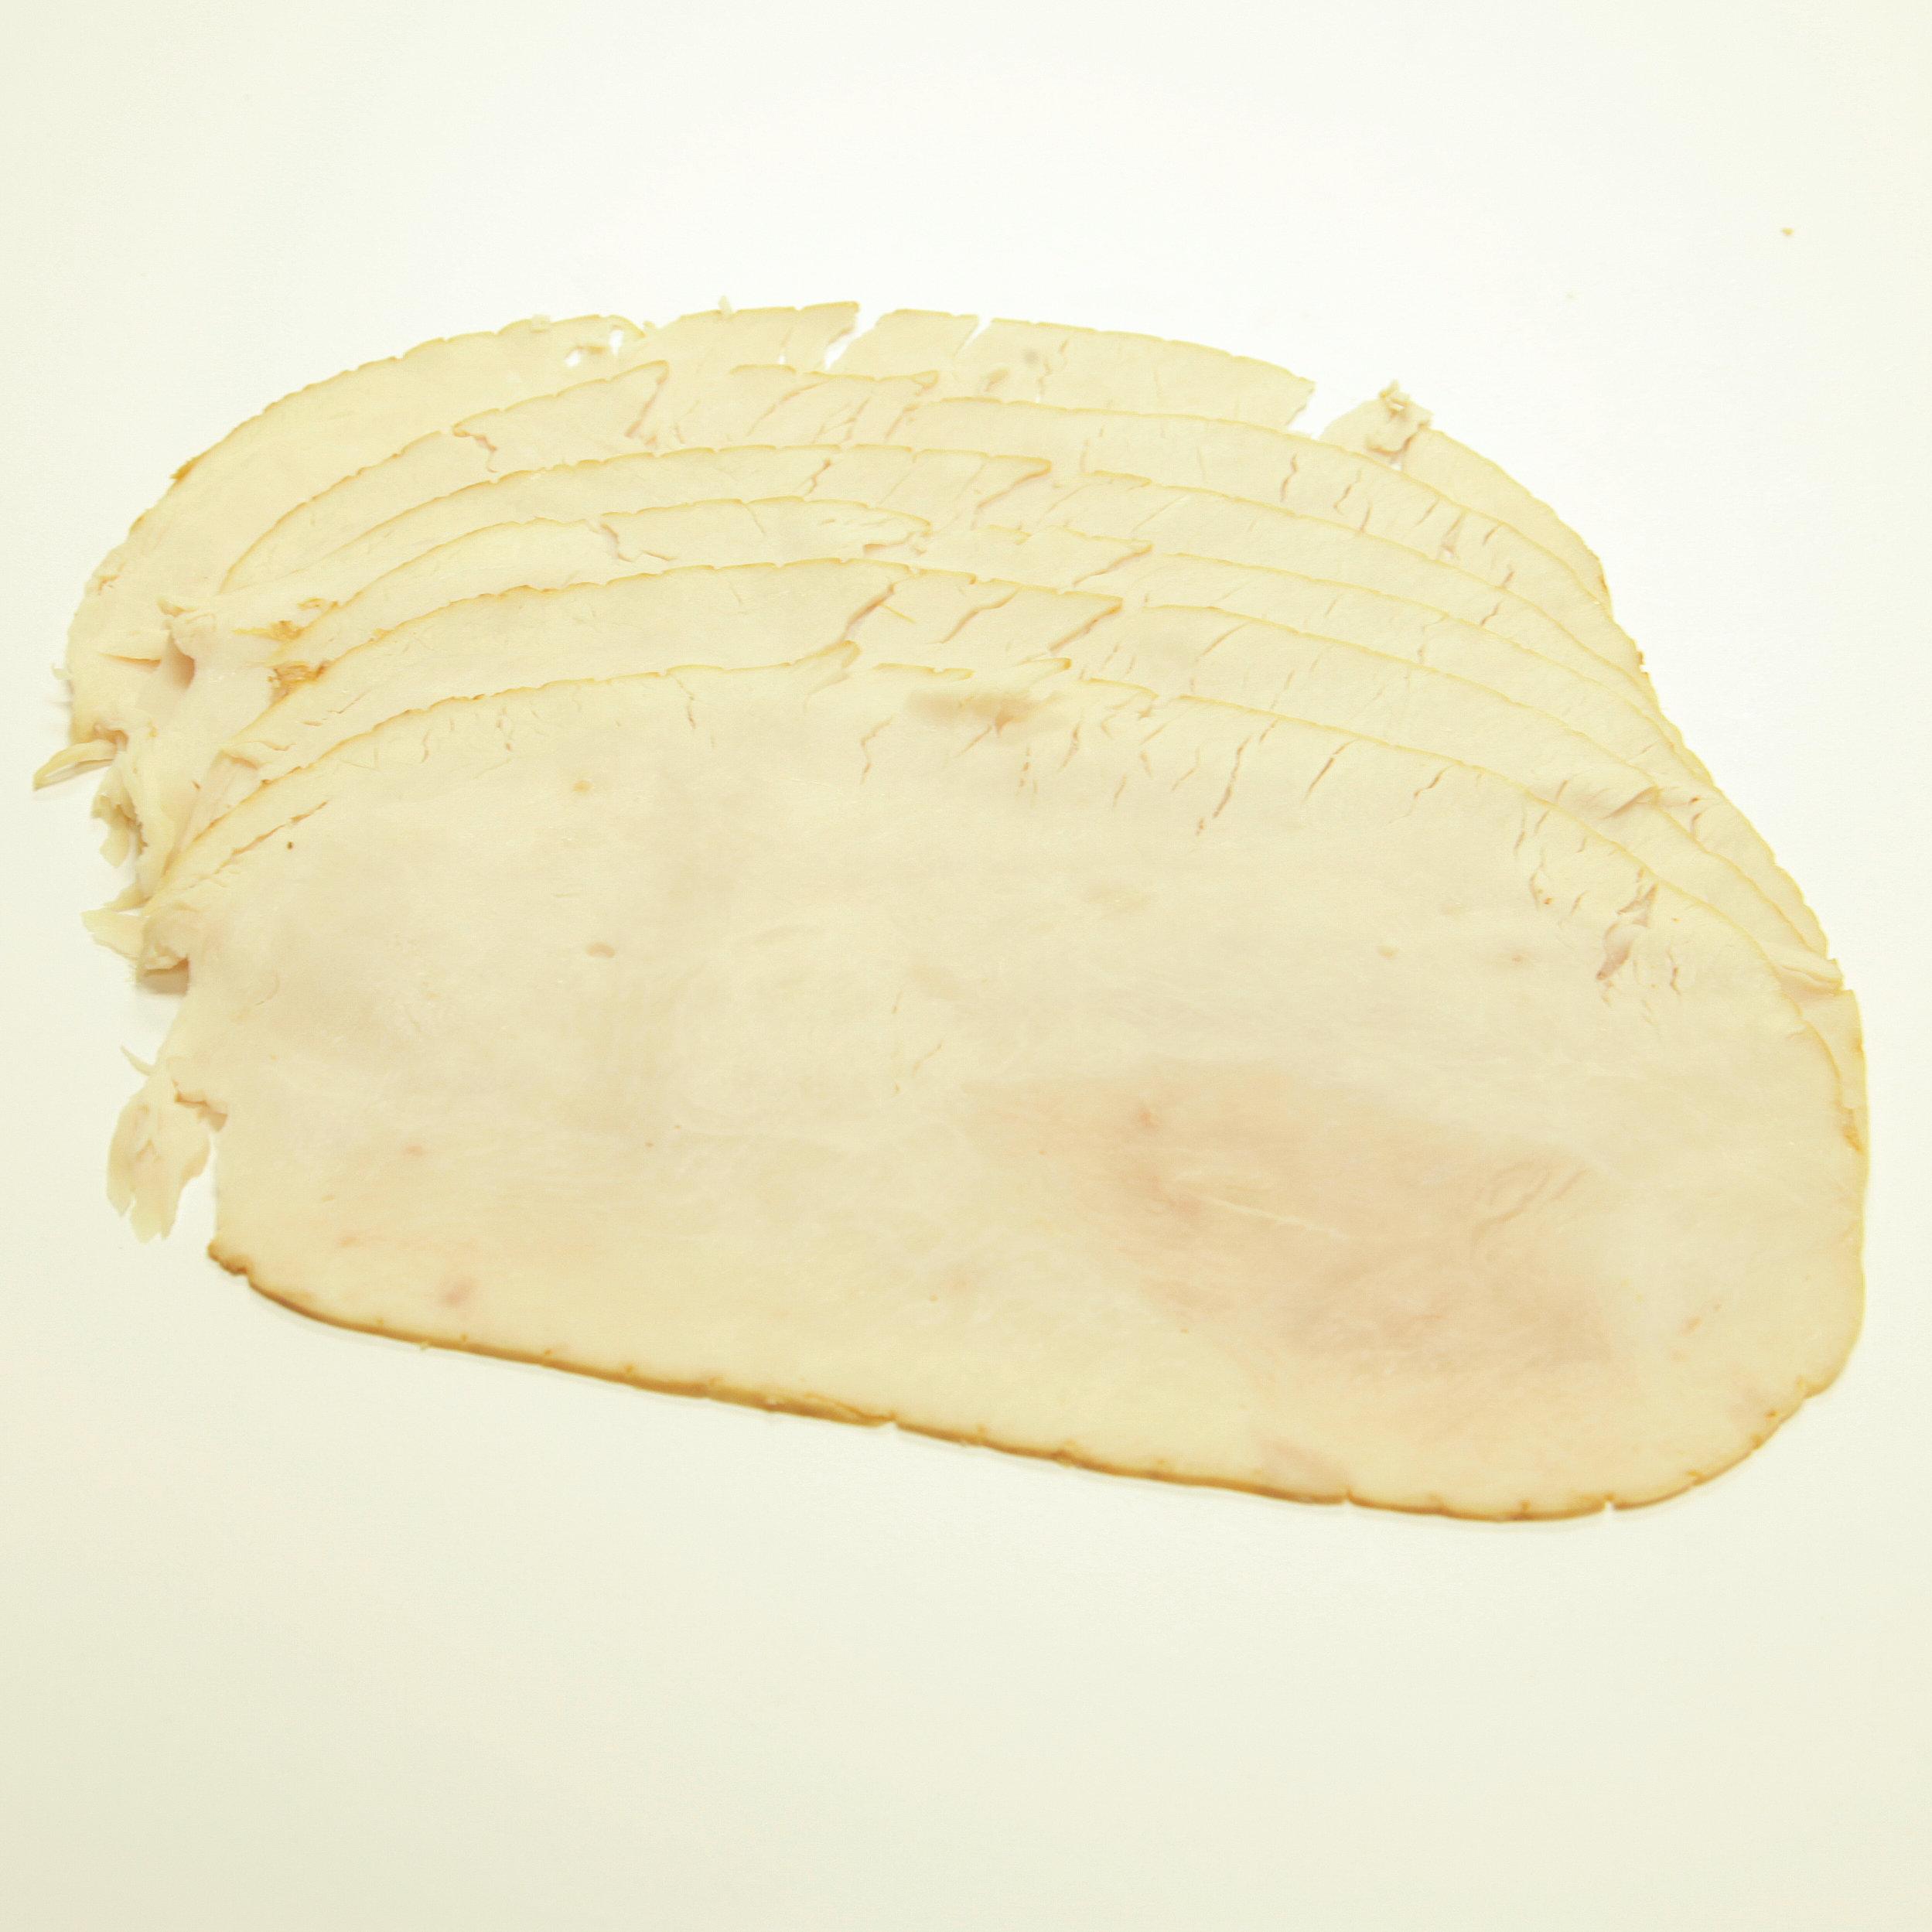 Low Sodium Turkey Breast, 8 oz. 00143